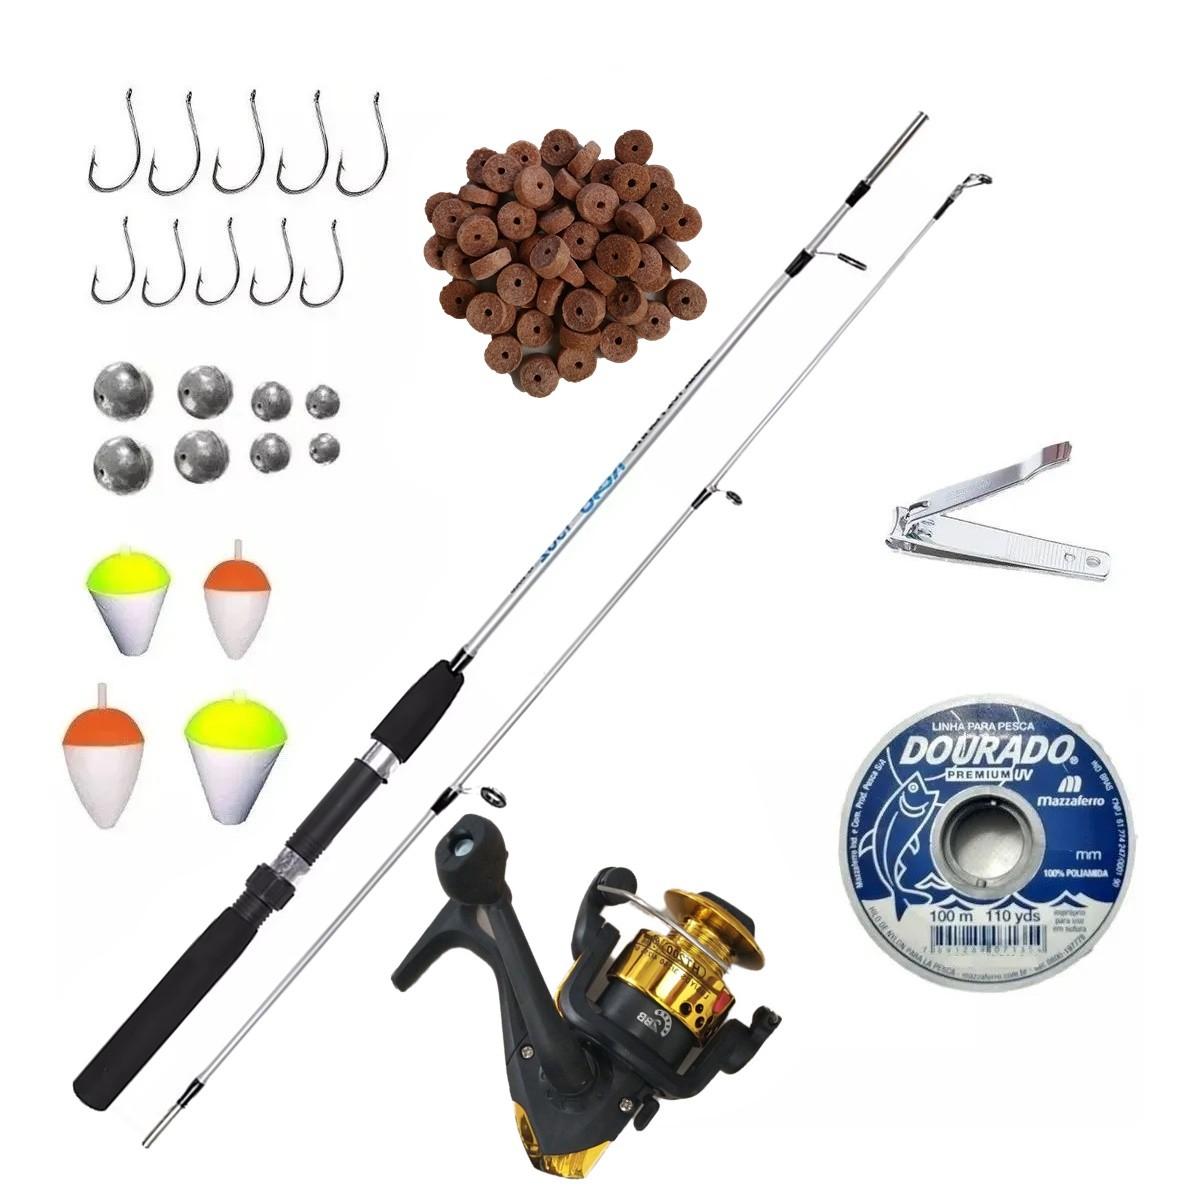 Kit De Pesca Completo Vara Molinete E Acessorios Pronto